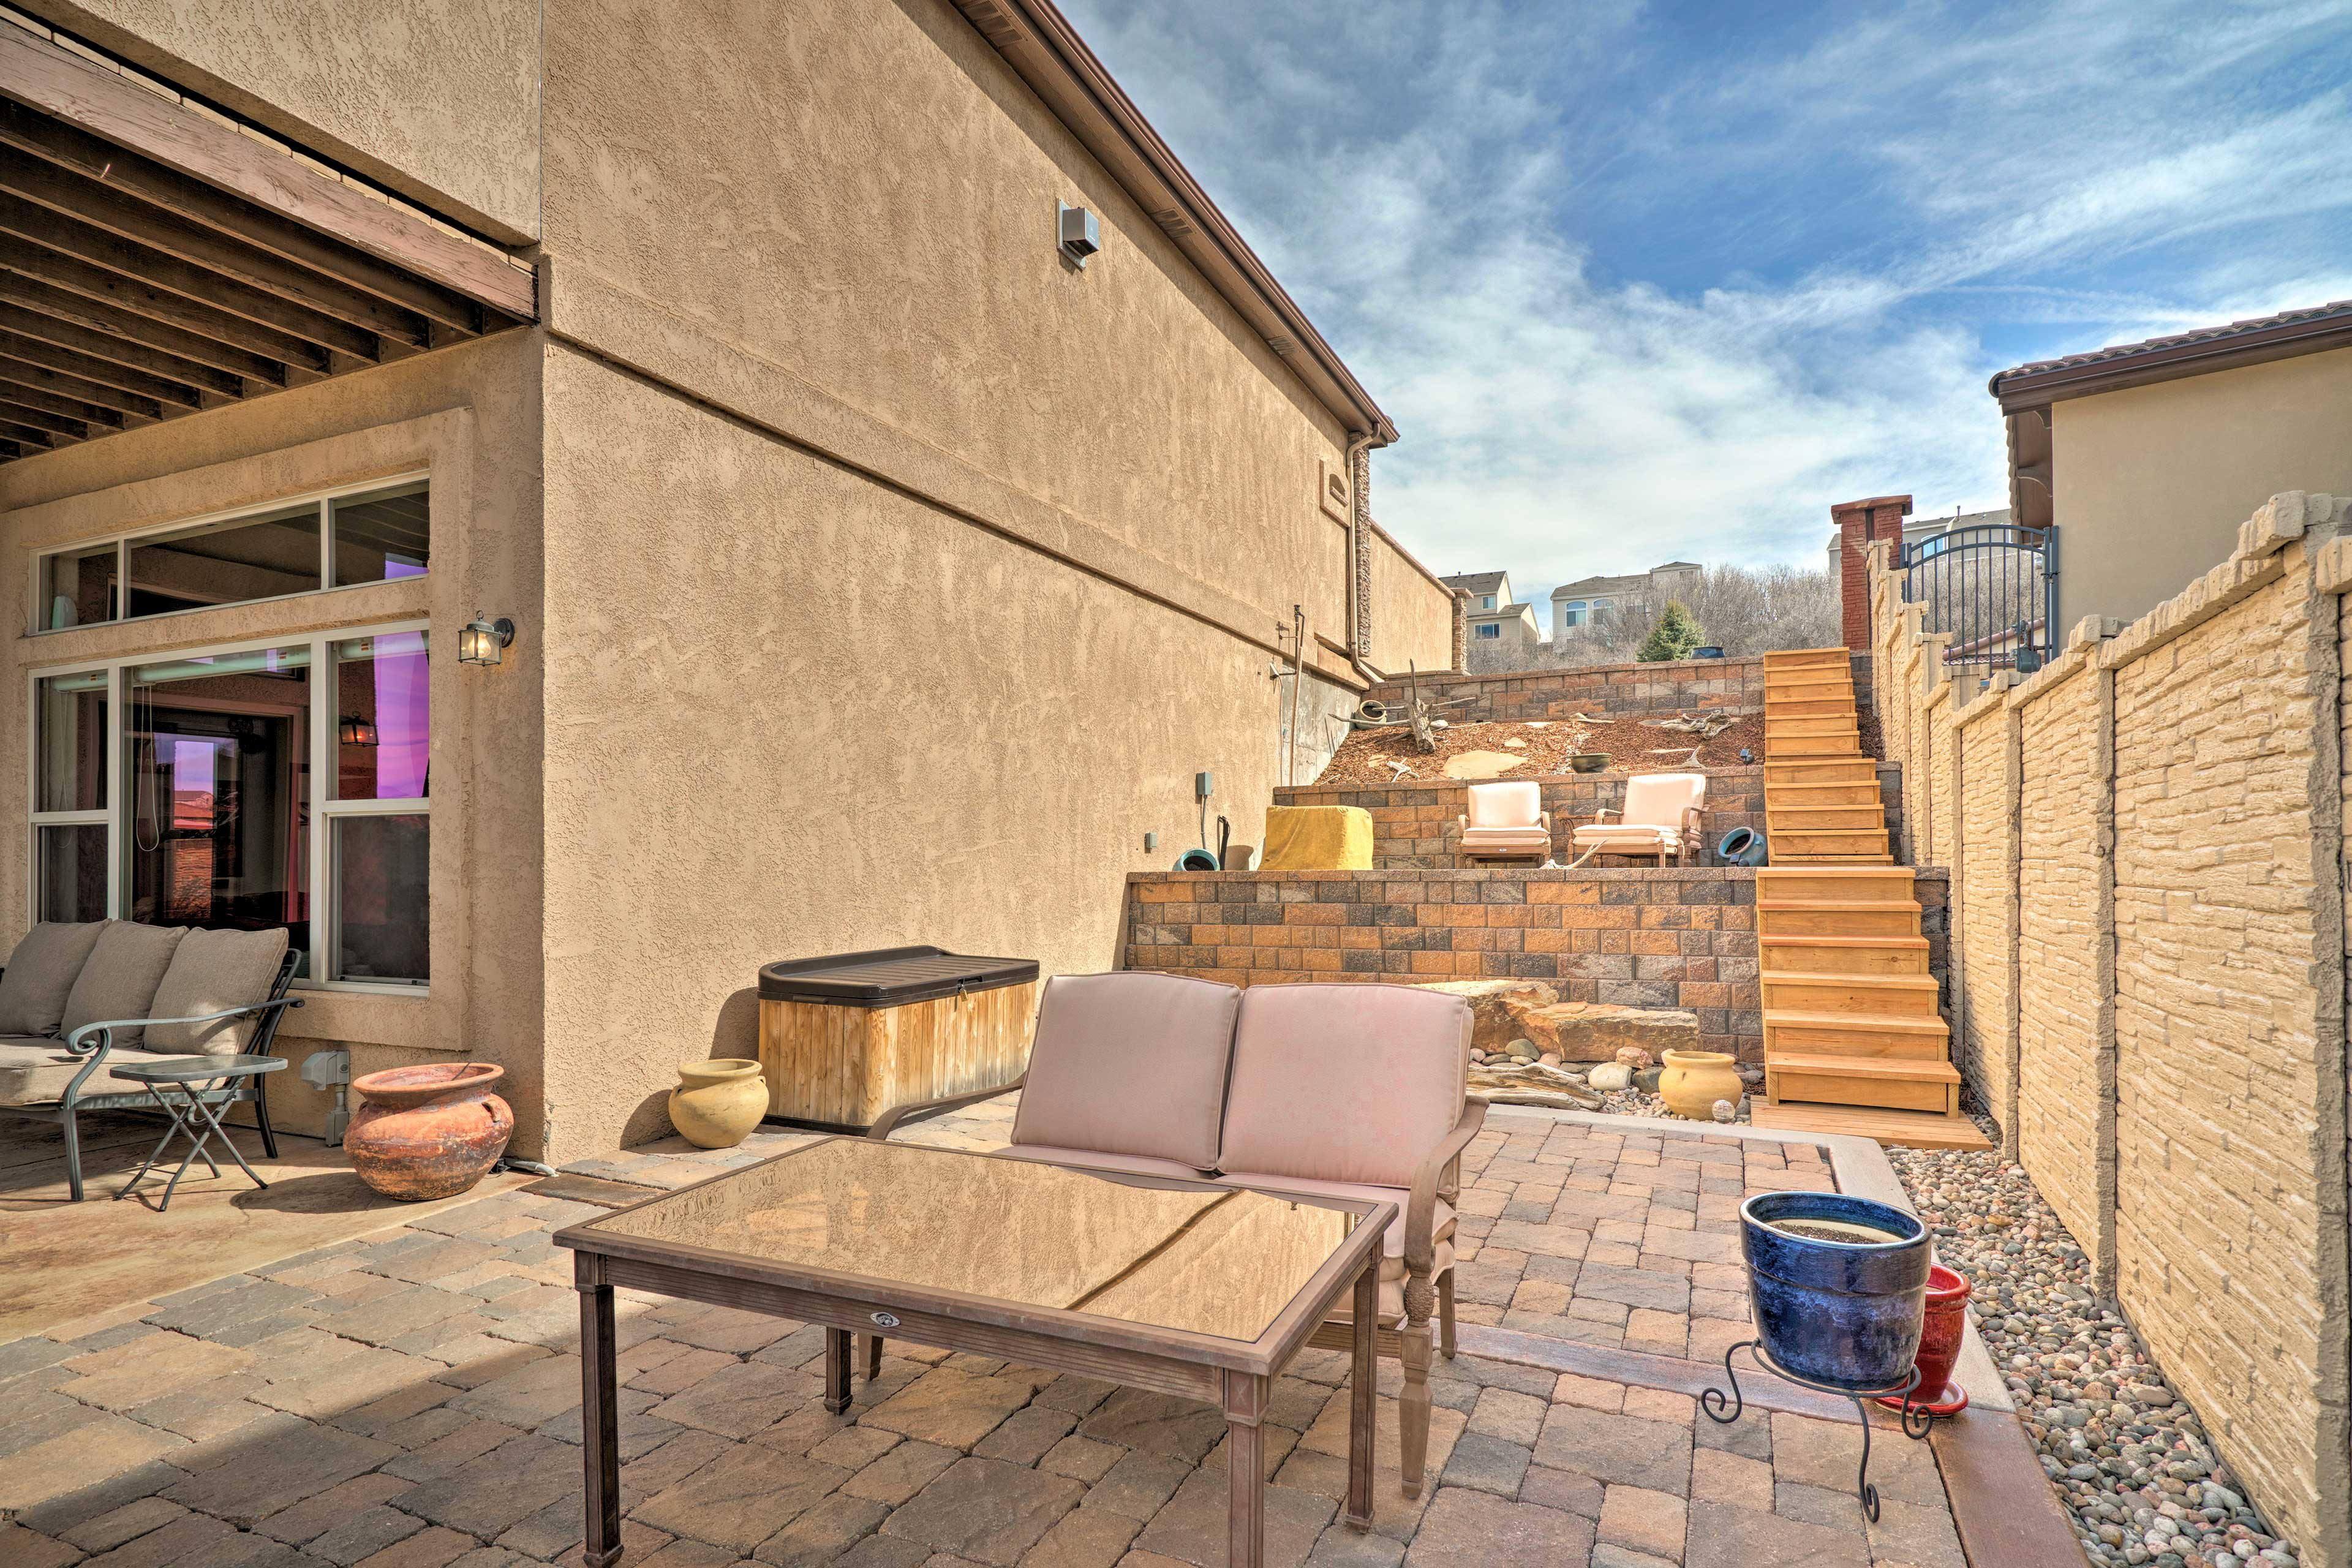 Descend the steps to the spacious garden-level patio.